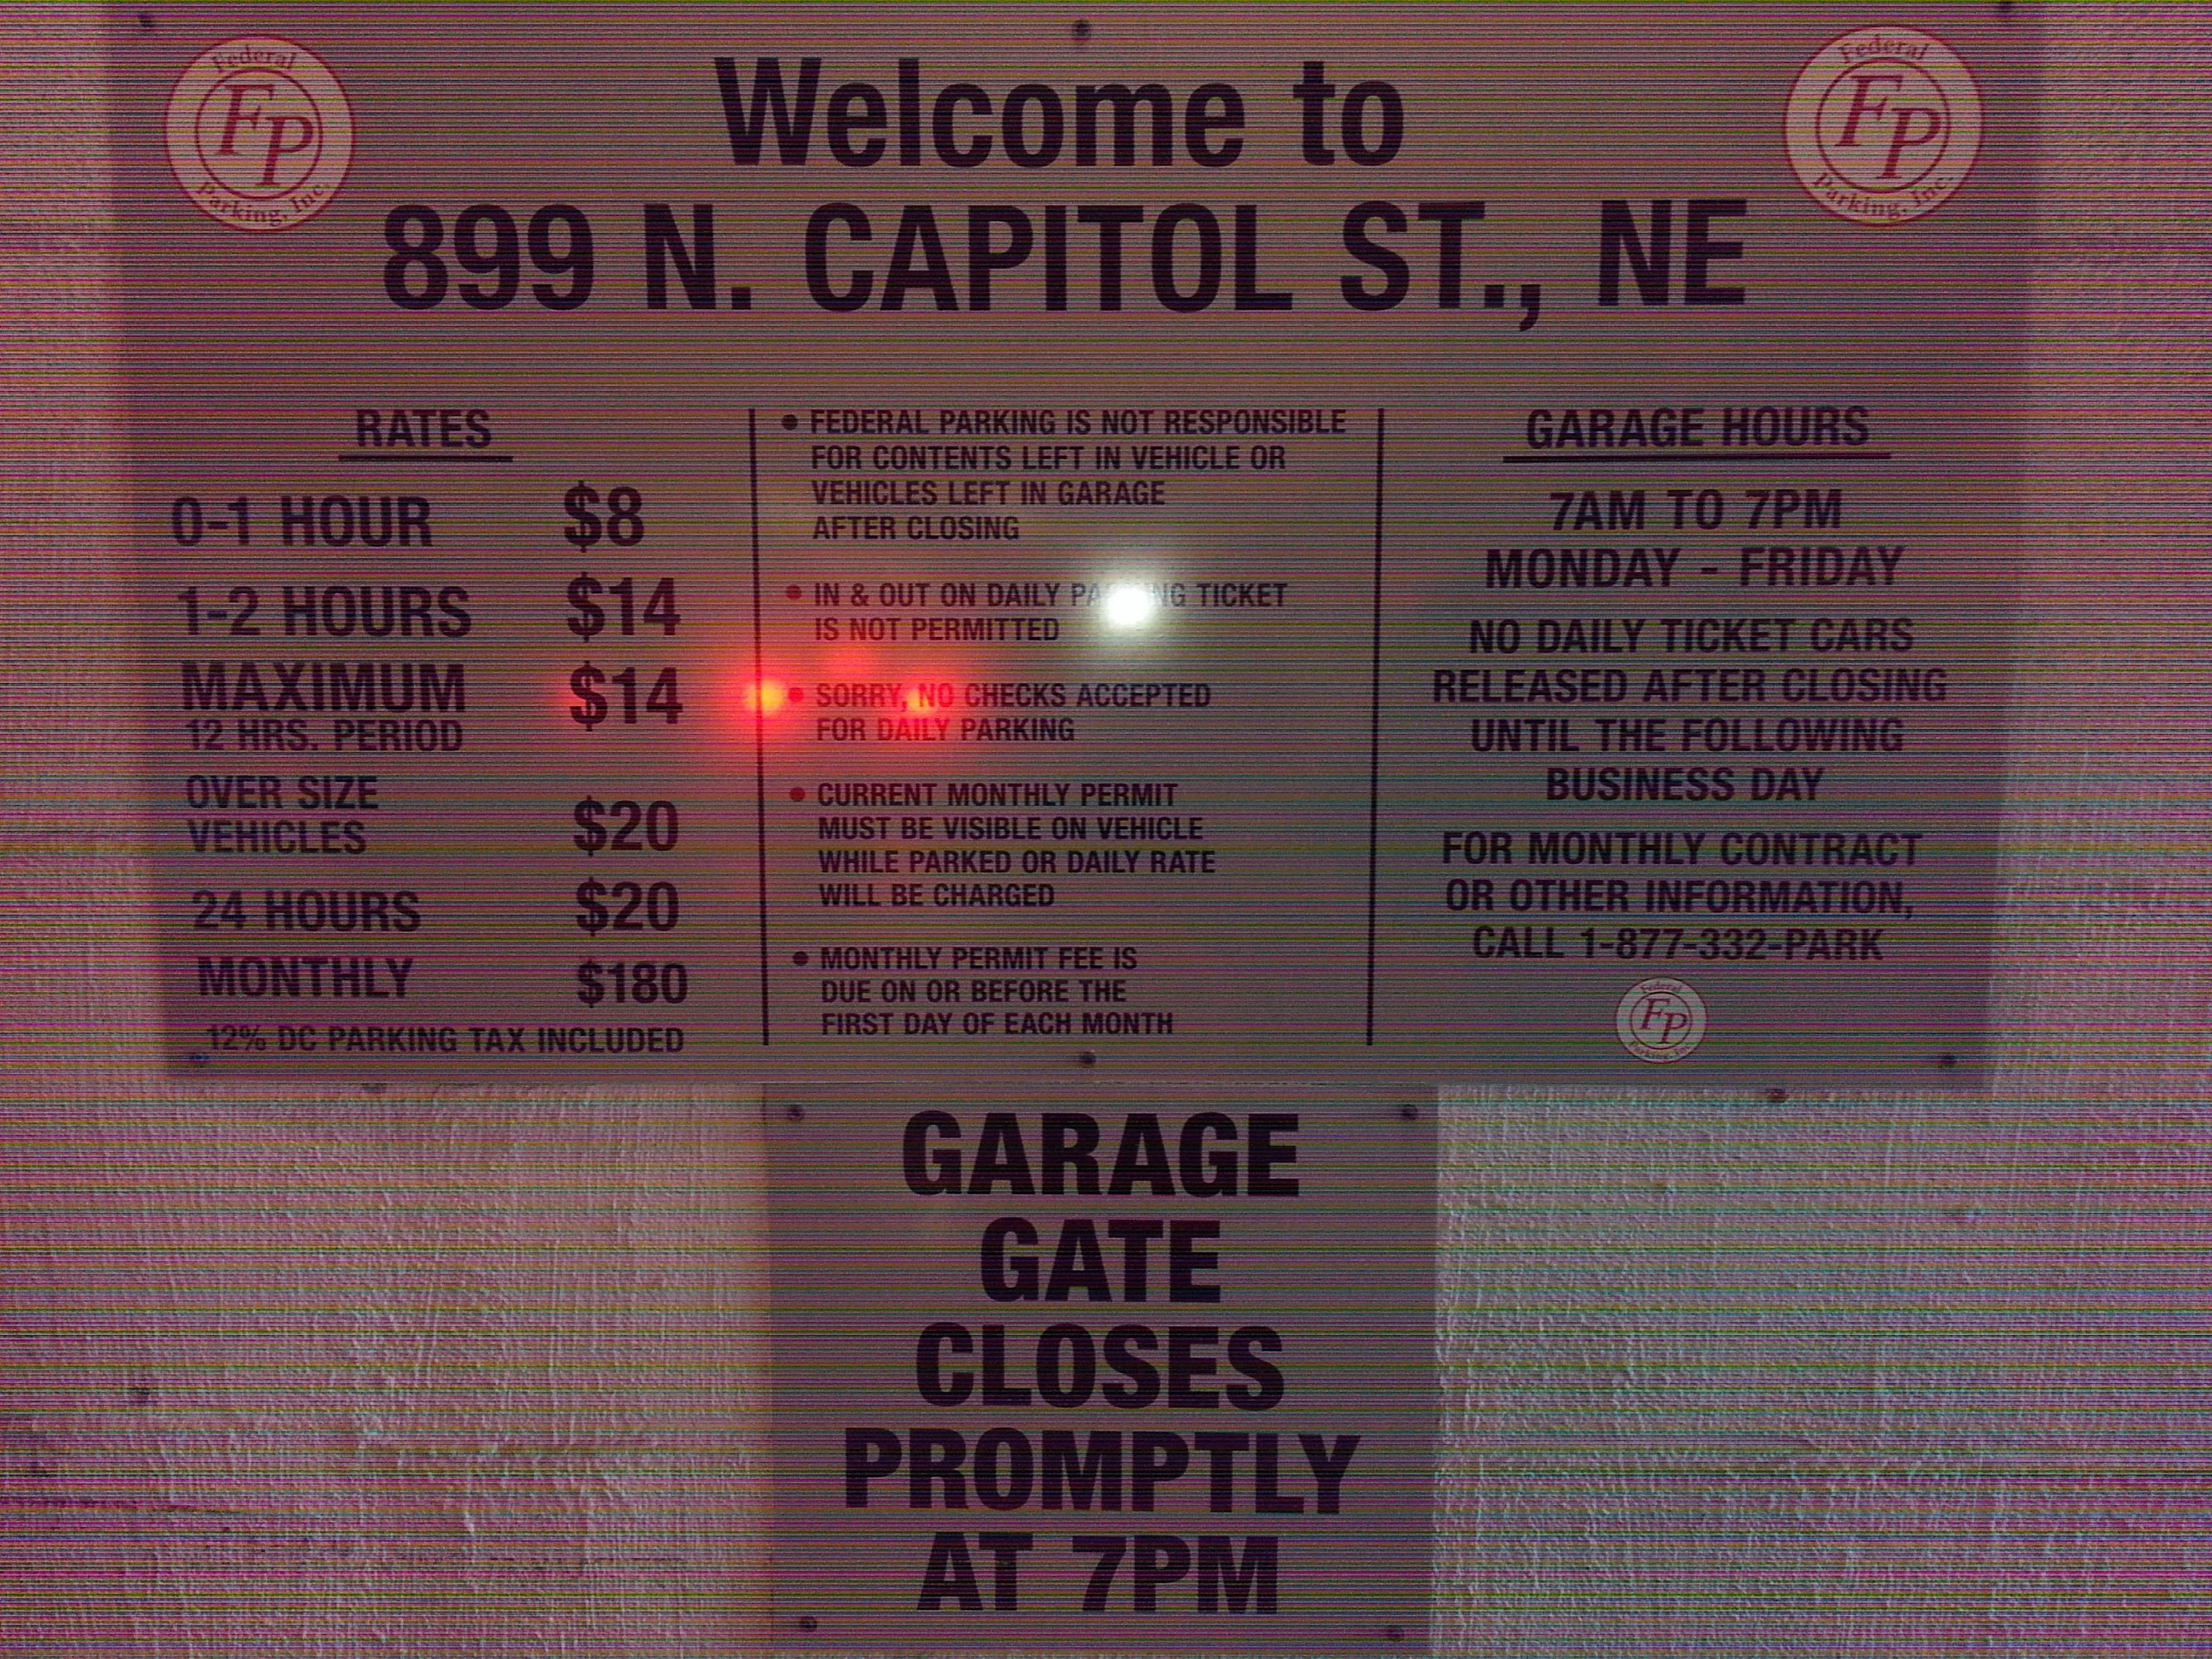 899 north capitol st ne garage parking in washington parkme 20 1betcityfo Images